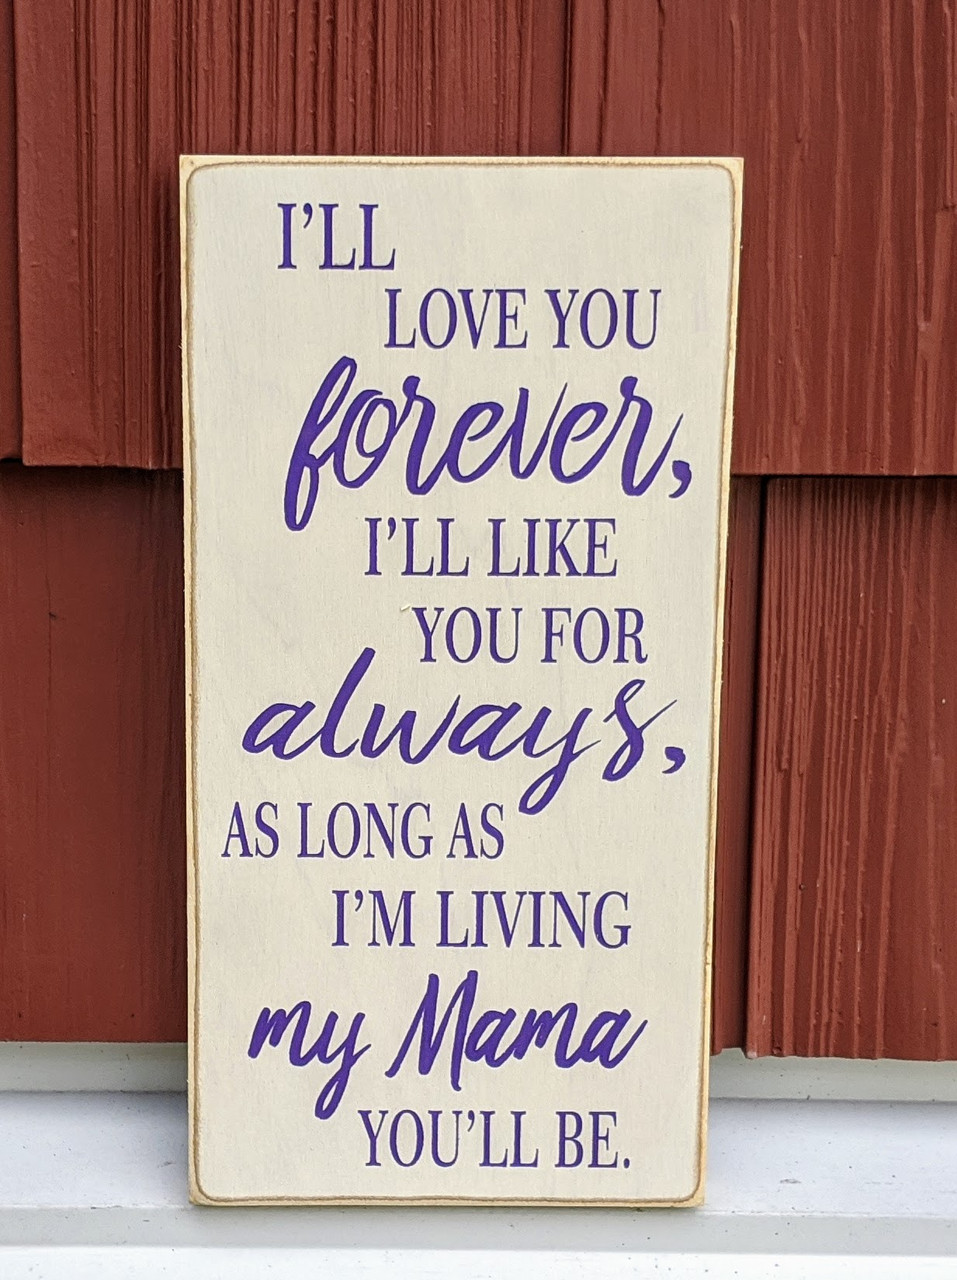 I'll love you forever - handmade wood sign